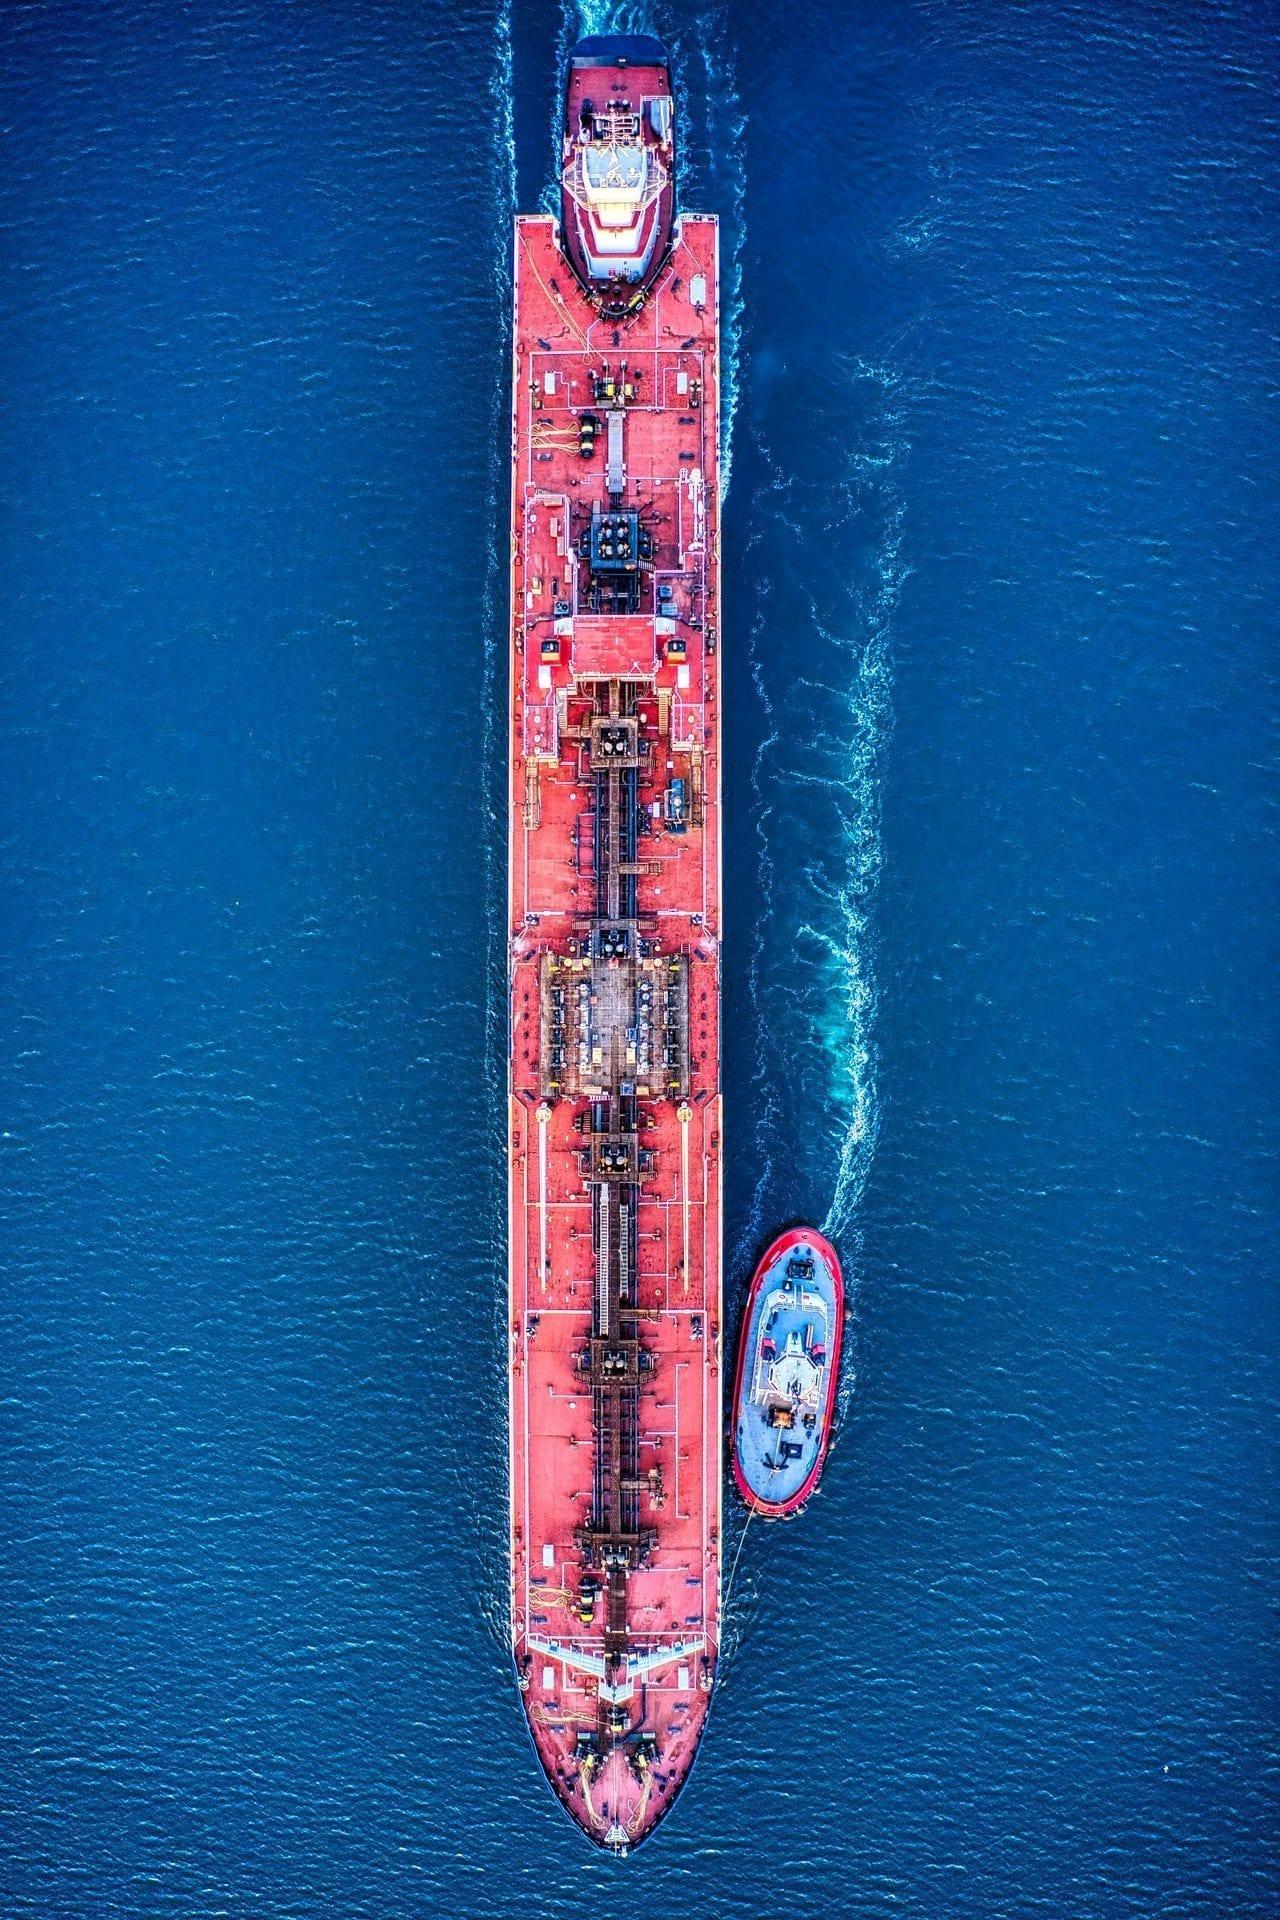 Cargo in the sea